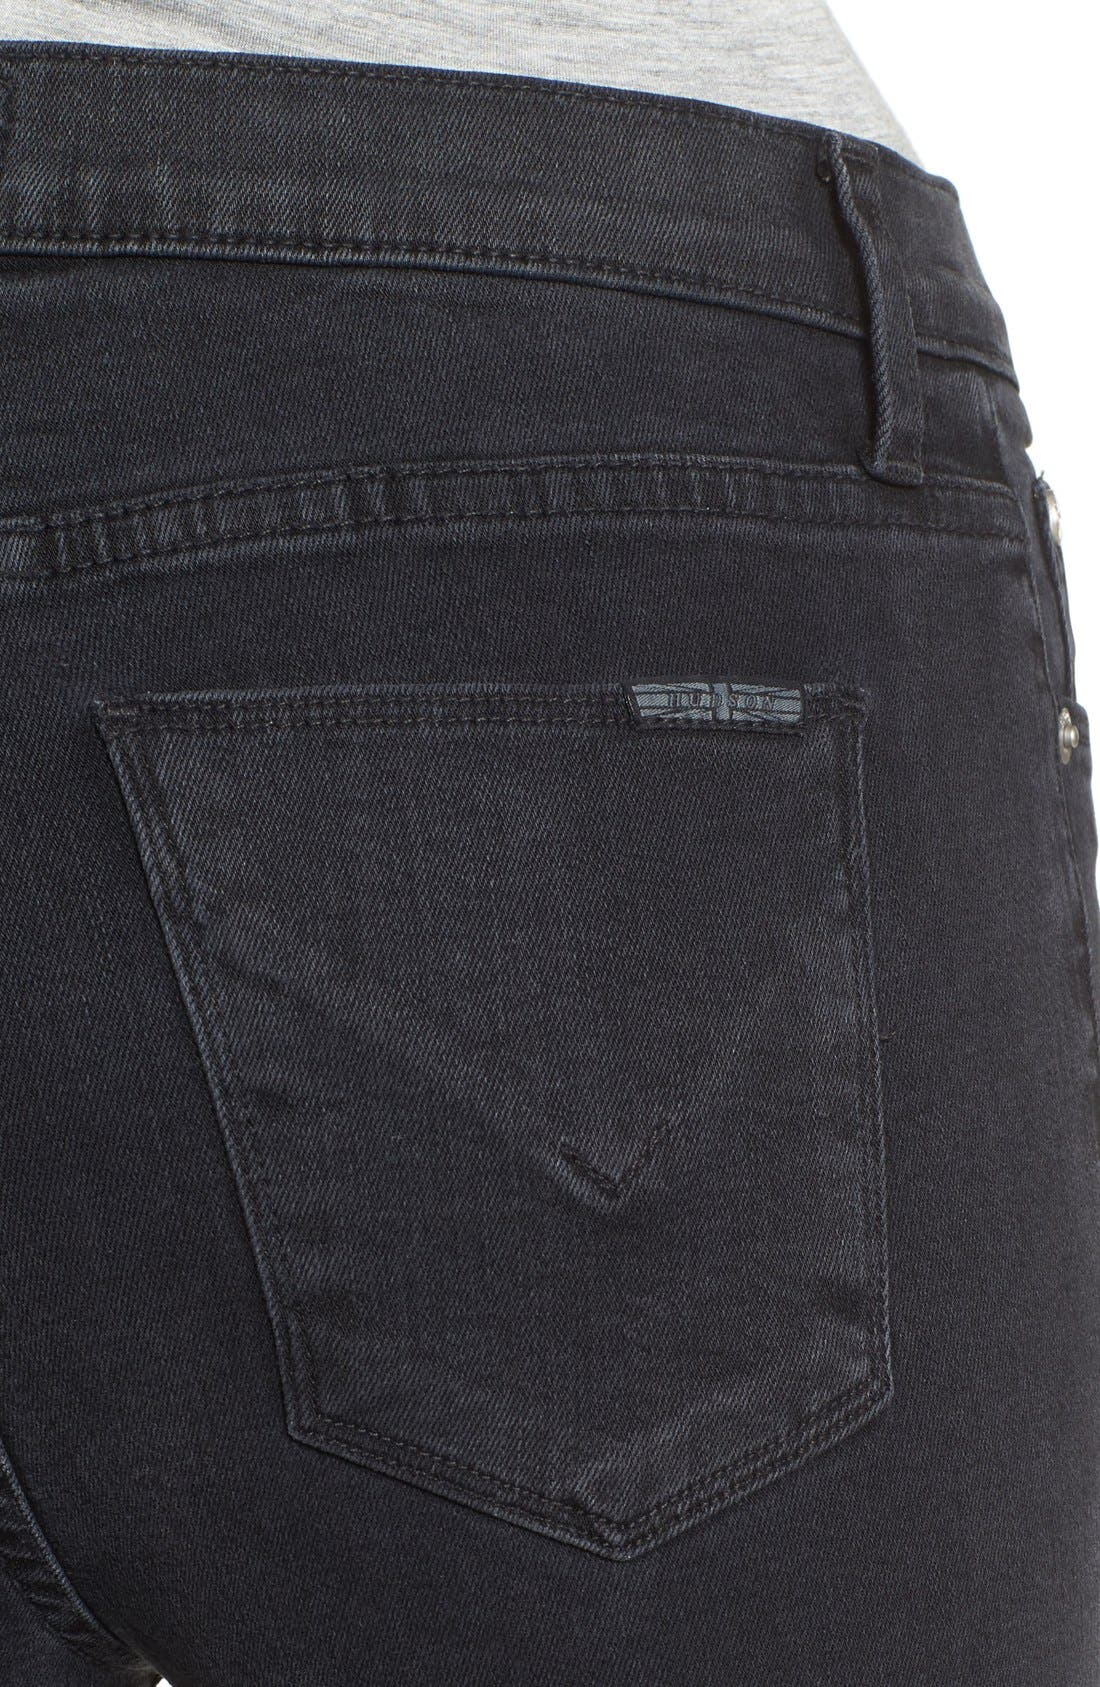 Alternate Image 4  - Hudson Jeans Barbara High Waist Super Skinny Jeans (Bazooka)